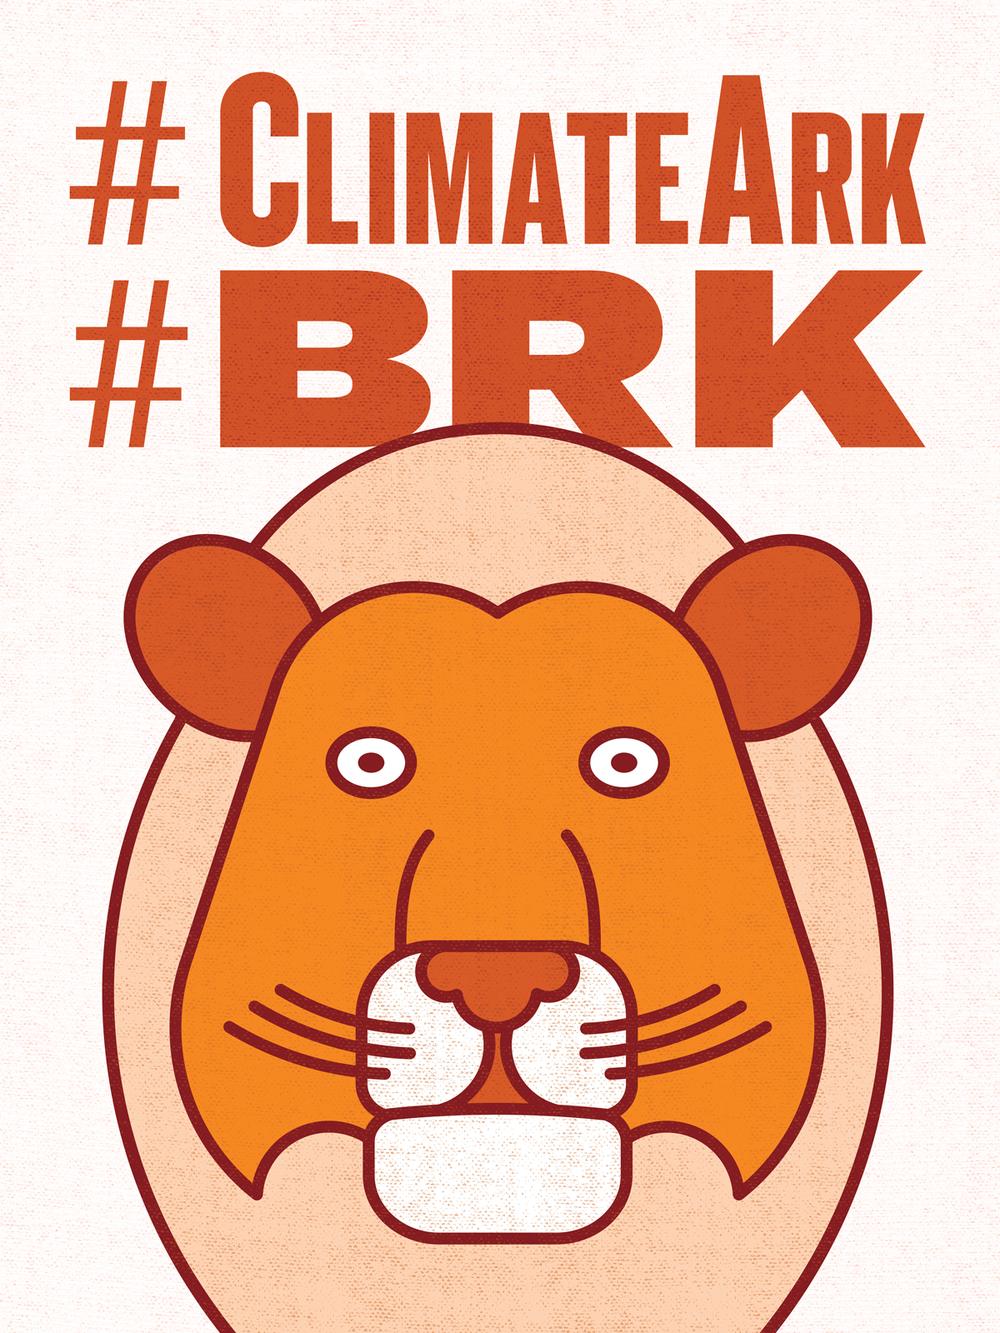 jkdc_boldrallies-climateark-Lion.png